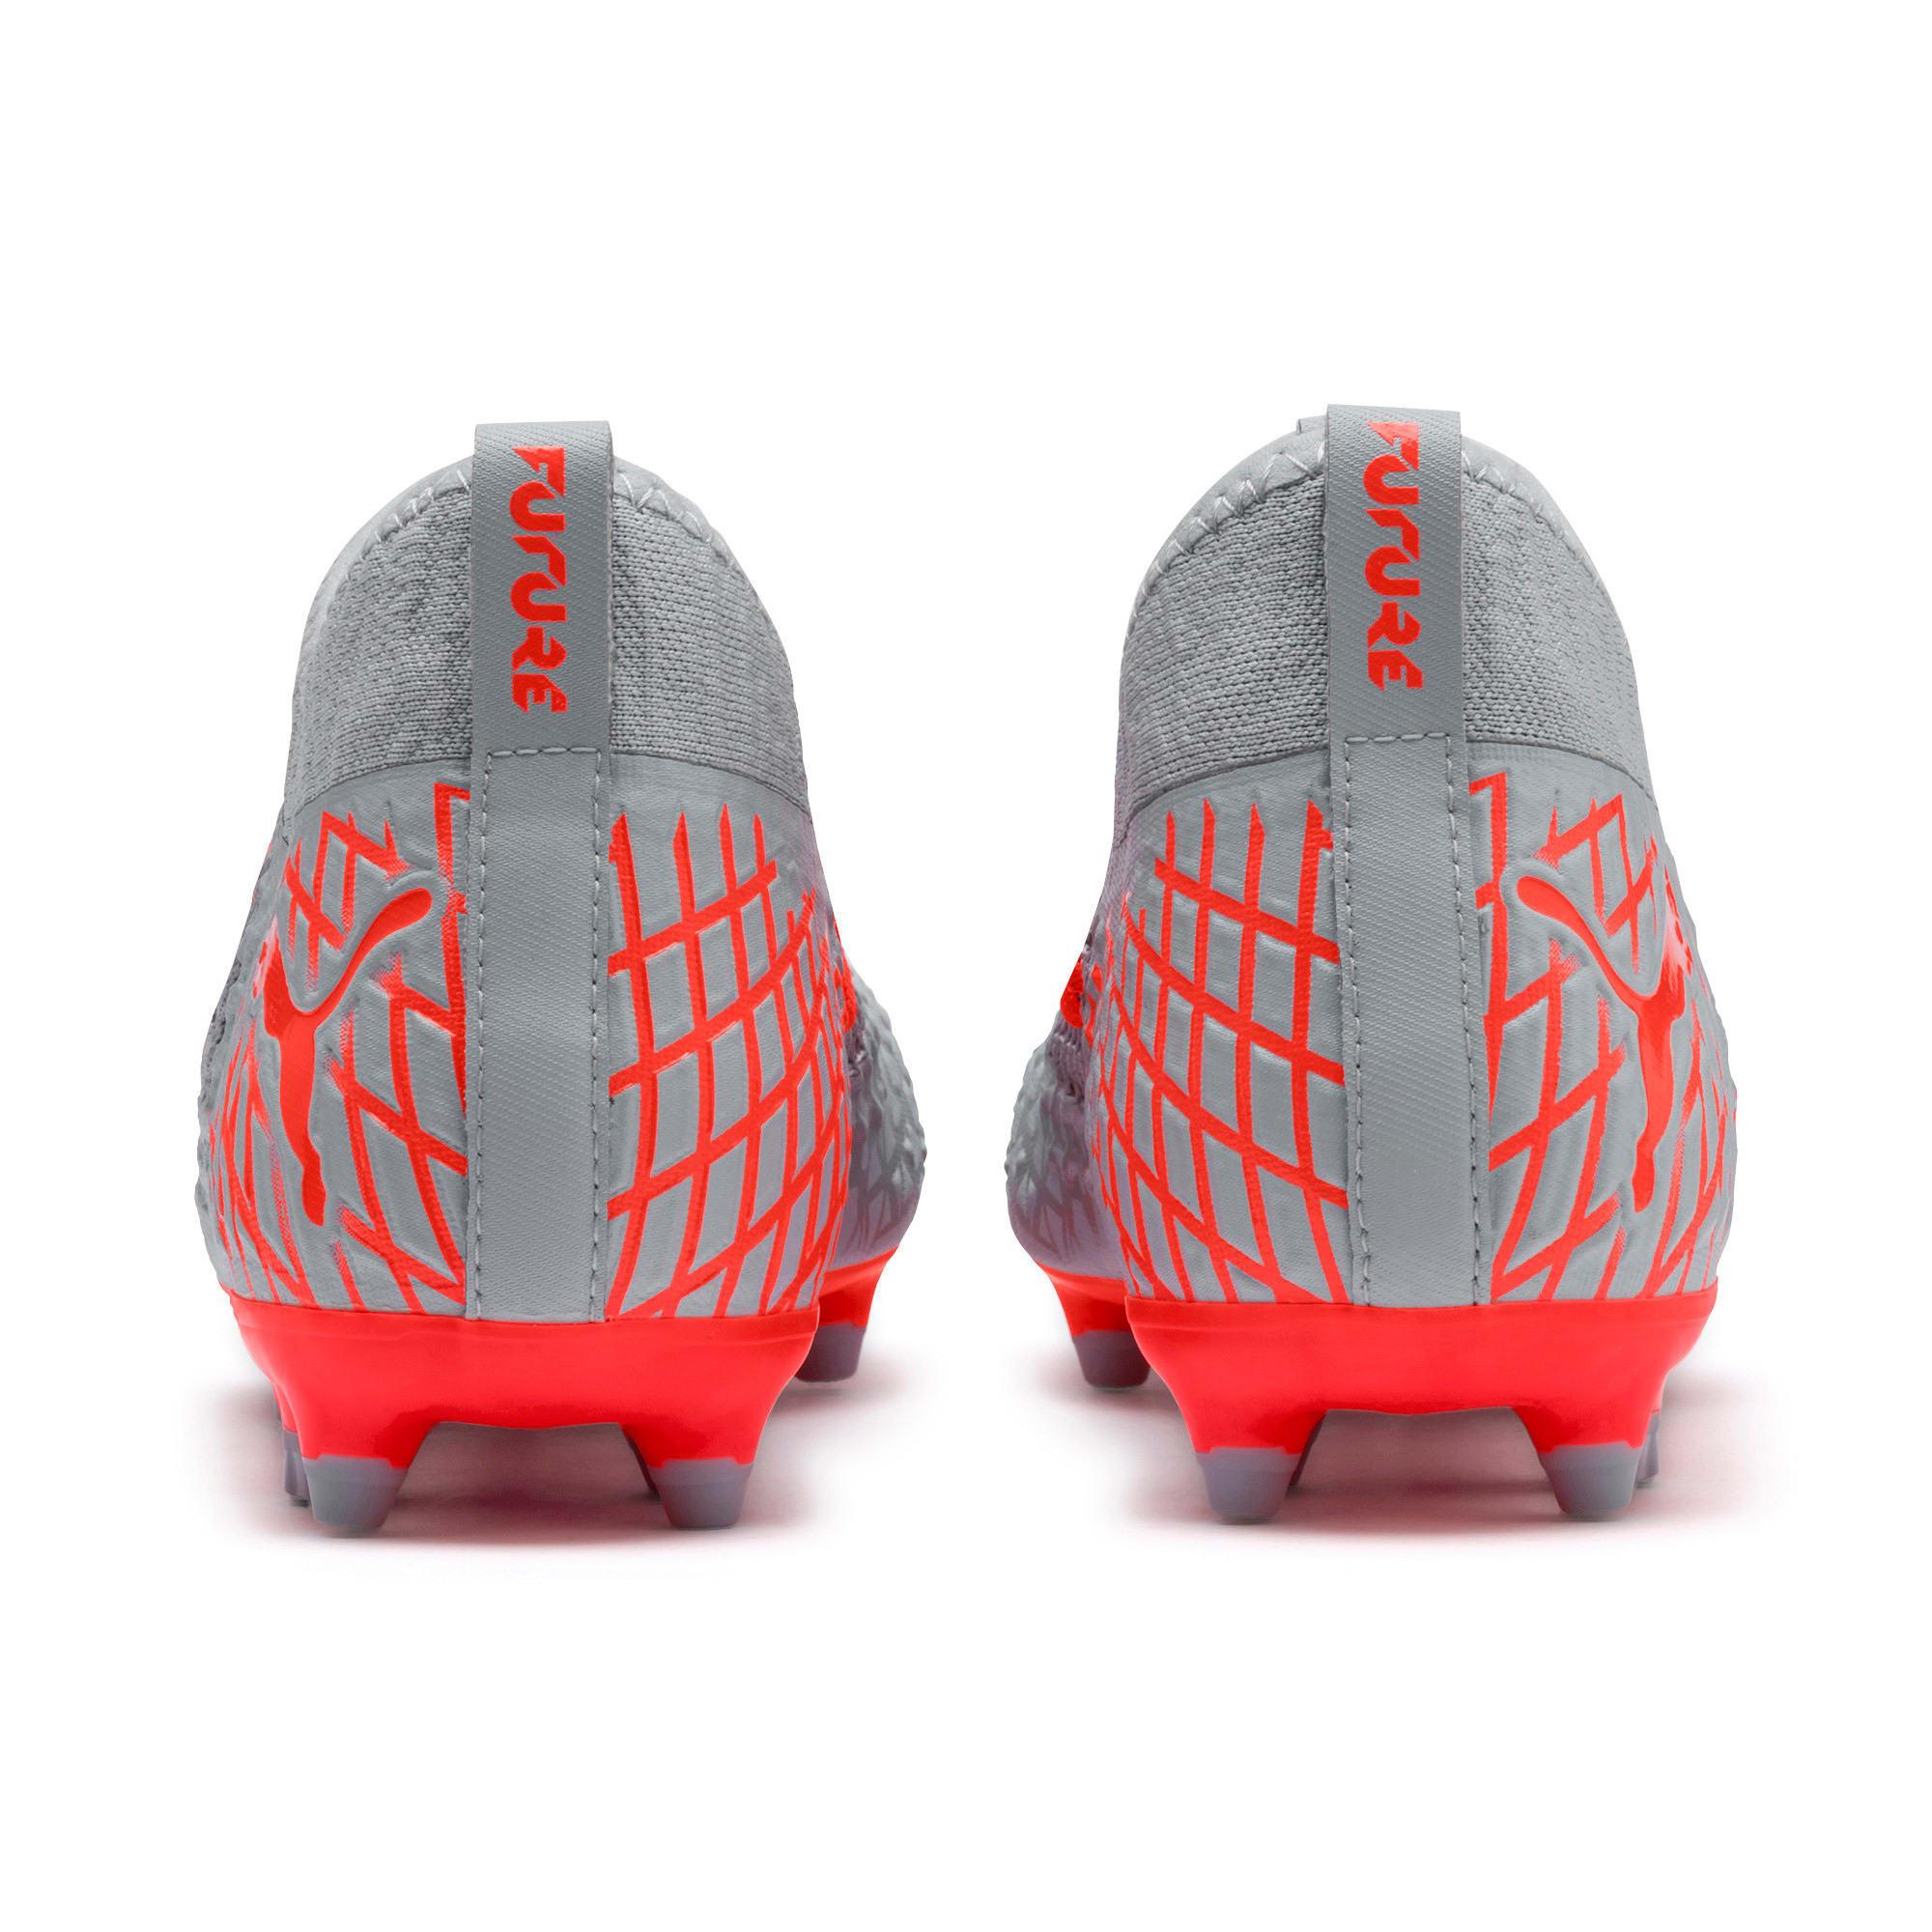 Anteprima 4 di FUTURE 4.3 NETFIT FG/AG Men's Football Boots, Glacial Blue-Nrgy Red, medio